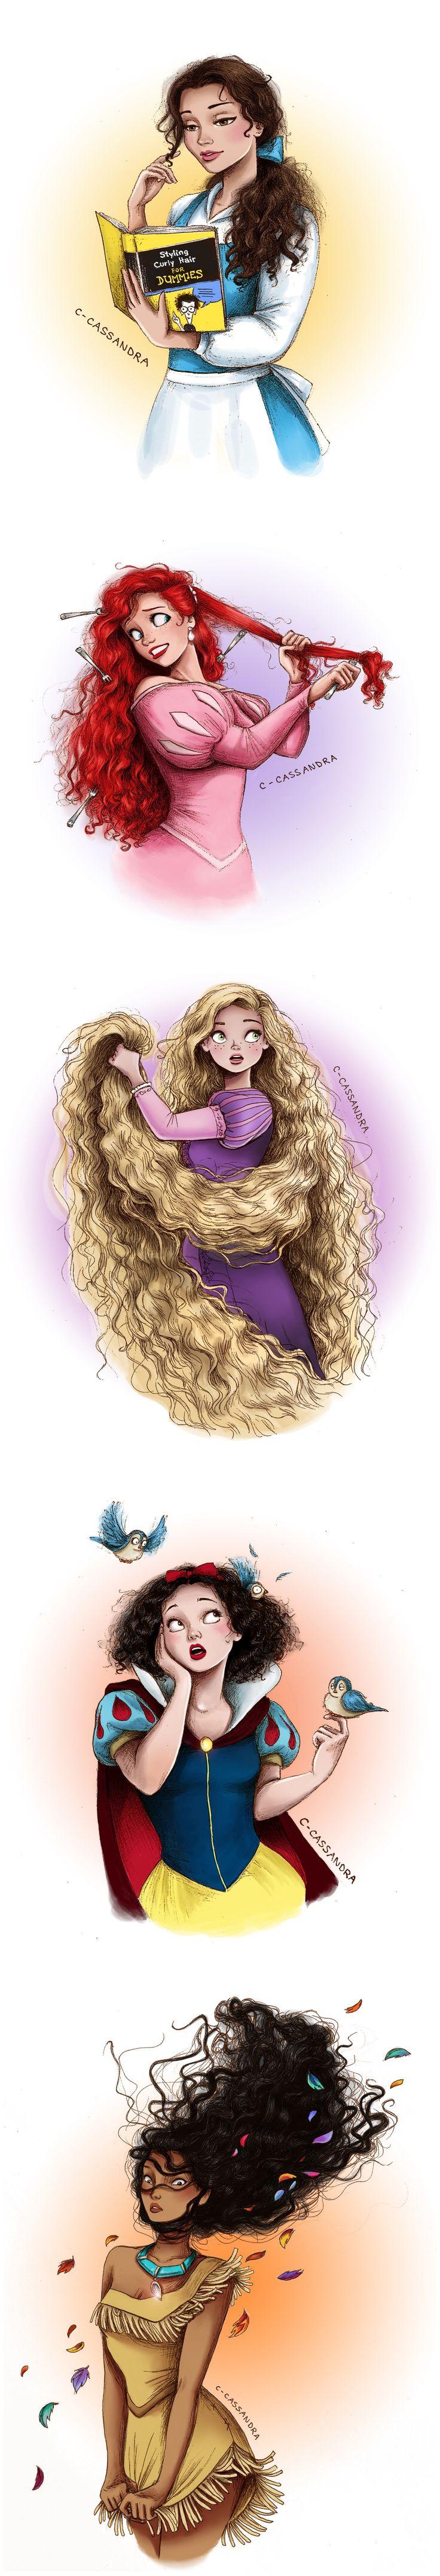 Disney | Curly hair | By C-cassandra